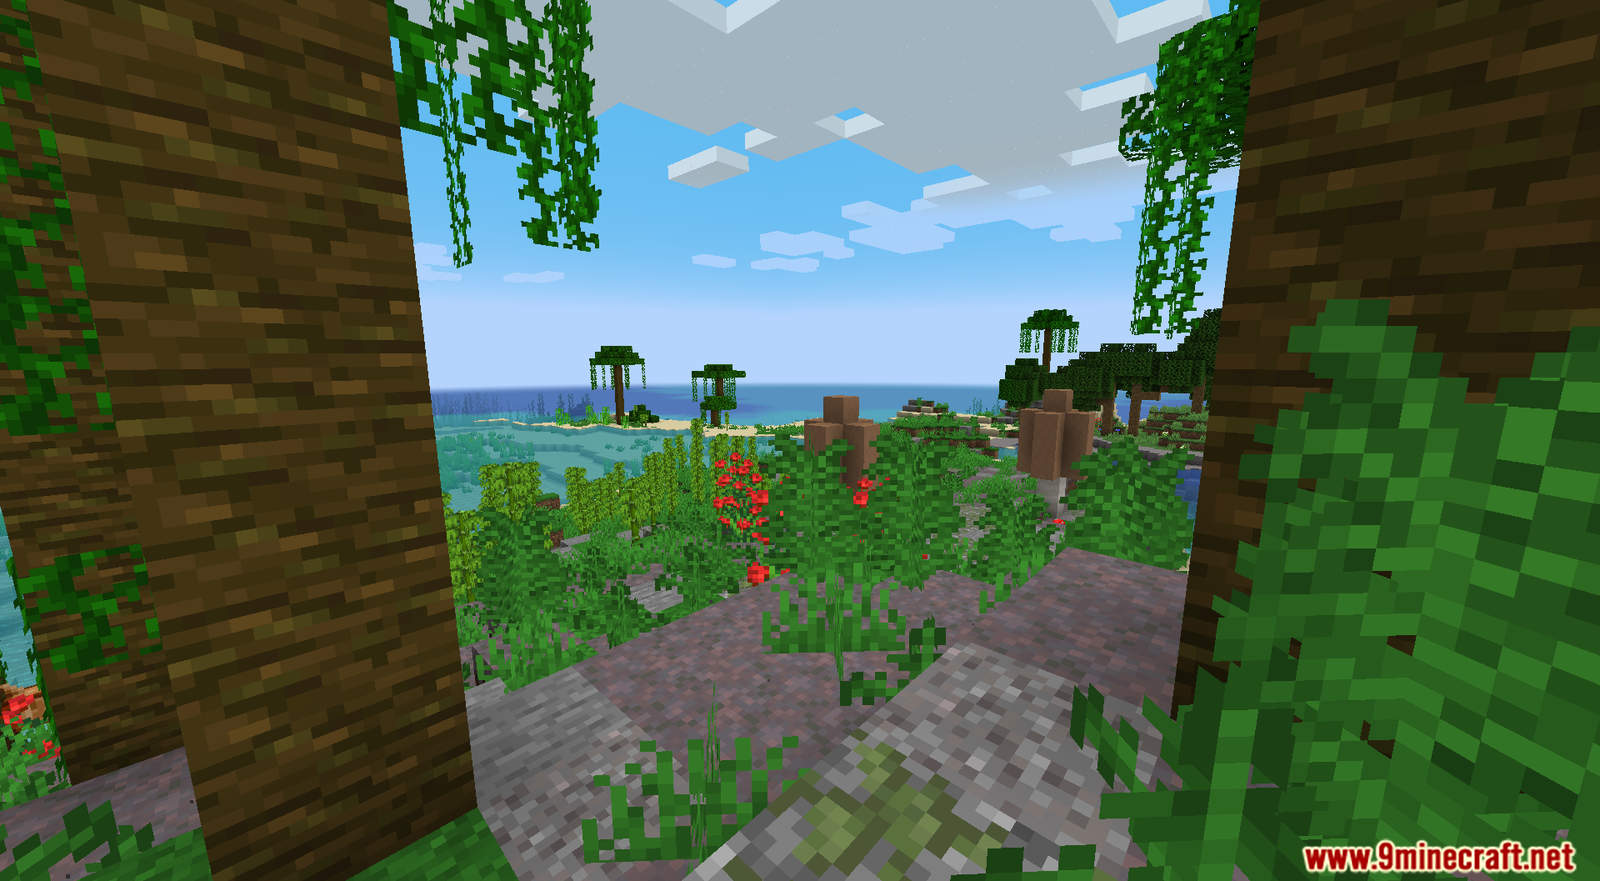 William Wythers' Overhauled Overworld Mod for Minecraft (16)